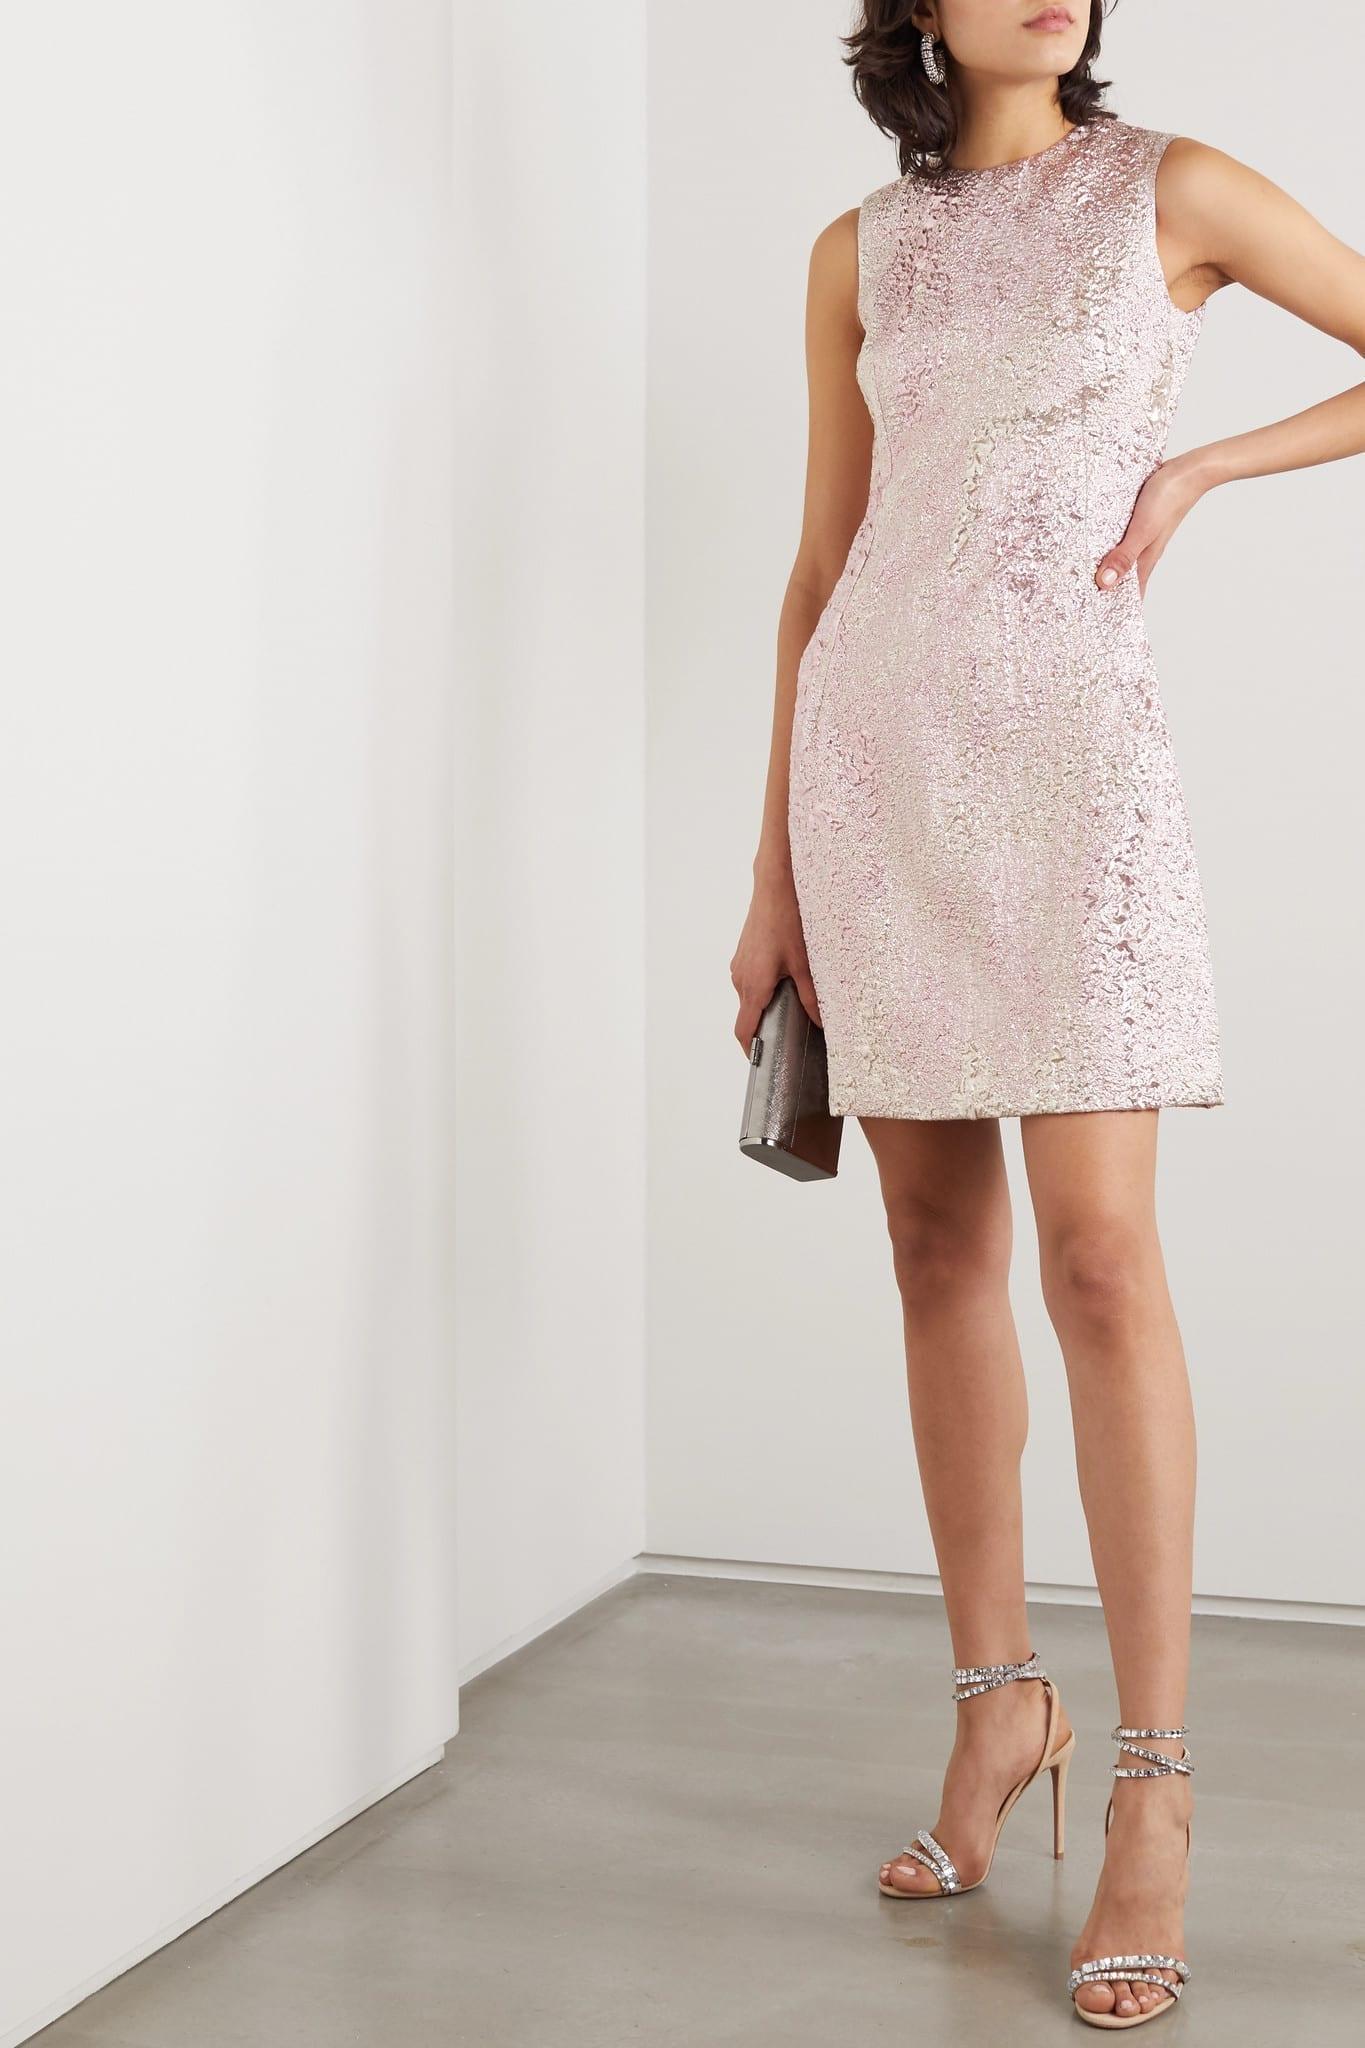 DOLCE & GABBANA Metallic Cloqué Mini Dress